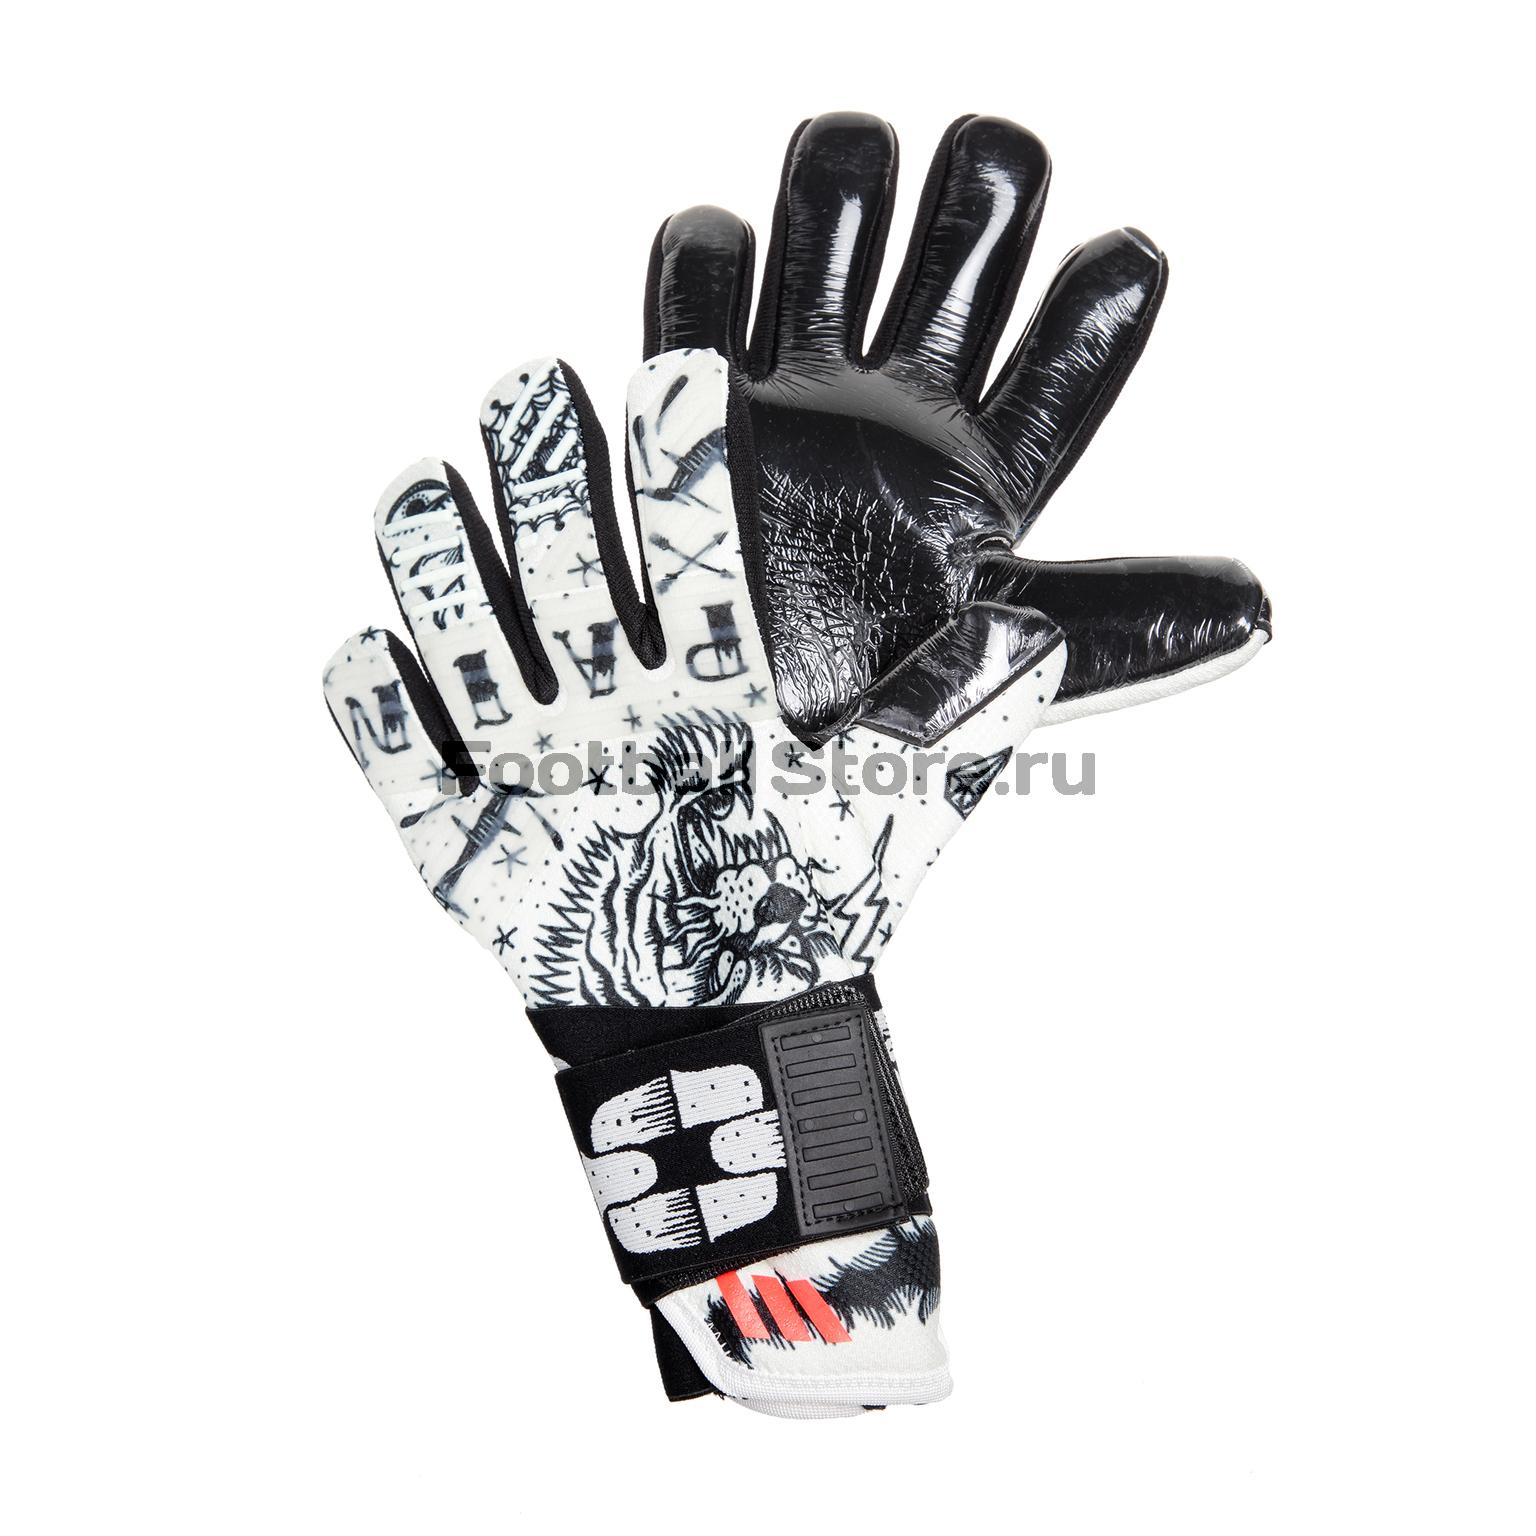 Перчатки Adidas Перчатки вратарские Adidas ACE 2-Face BS4118 цены онлайн